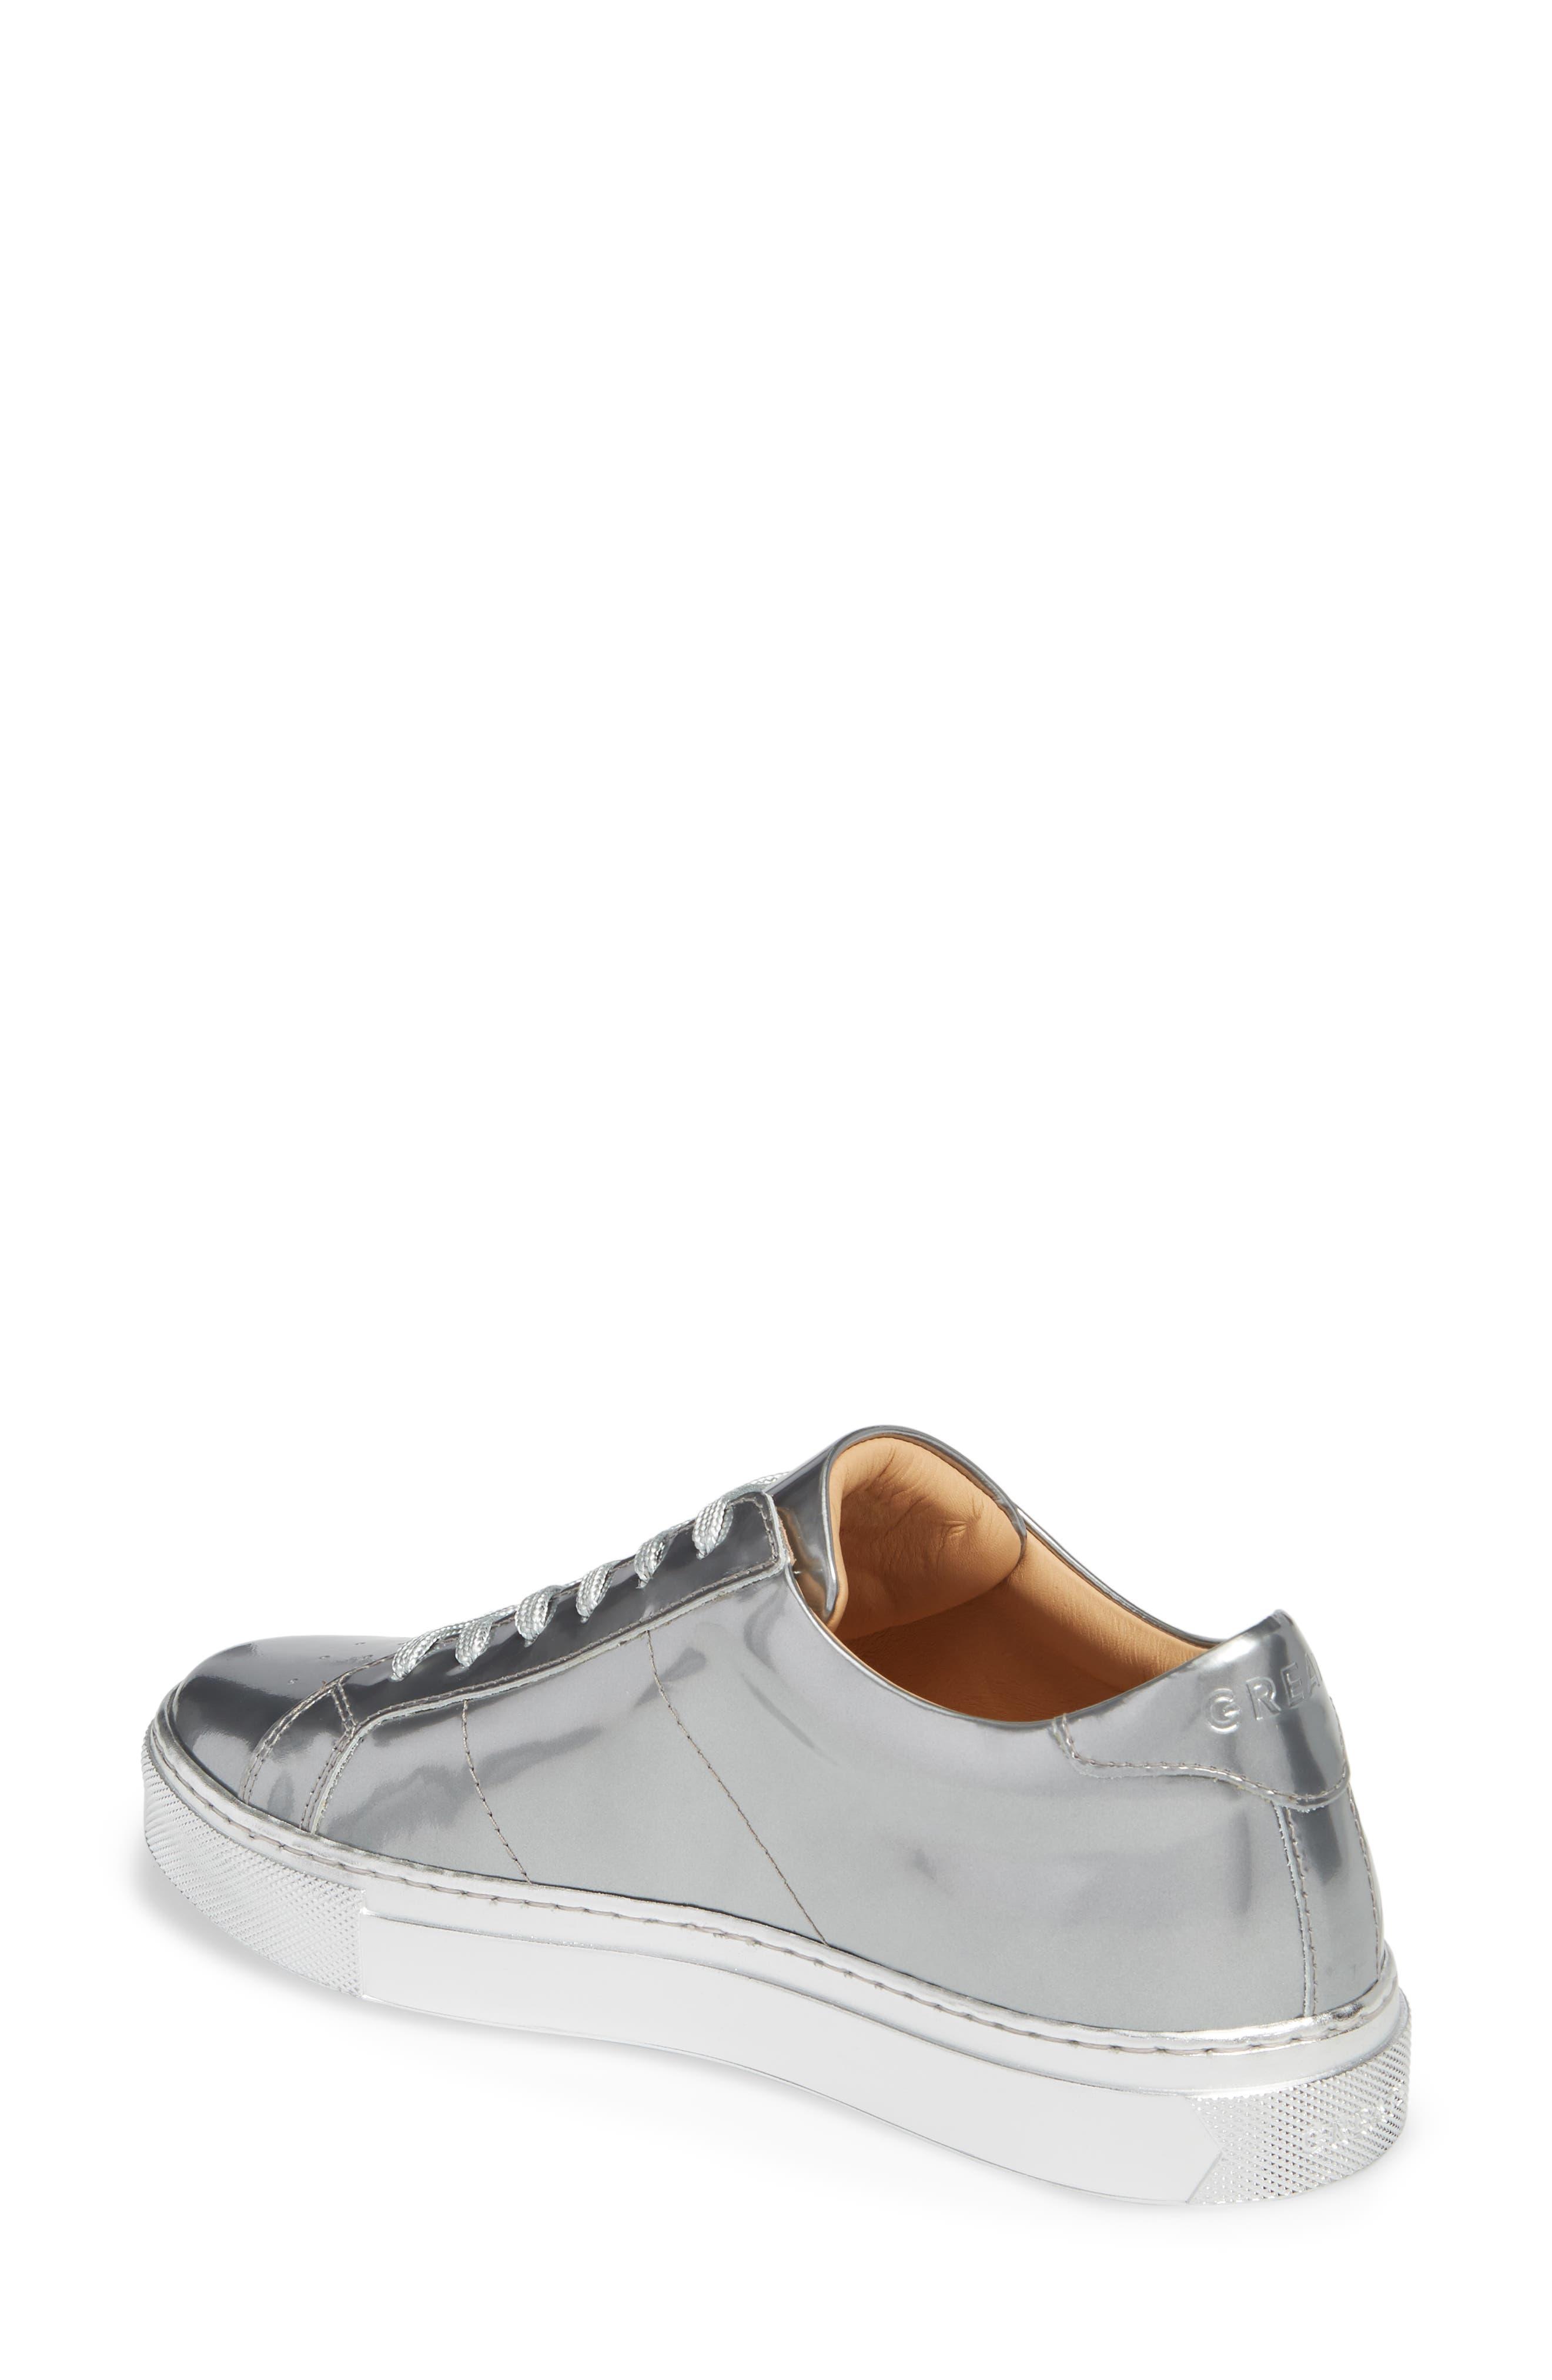 Royale Low Top Sneaker,                             Alternate thumbnail 2, color,                             SILVER TONAL/ FLAT LEATHER